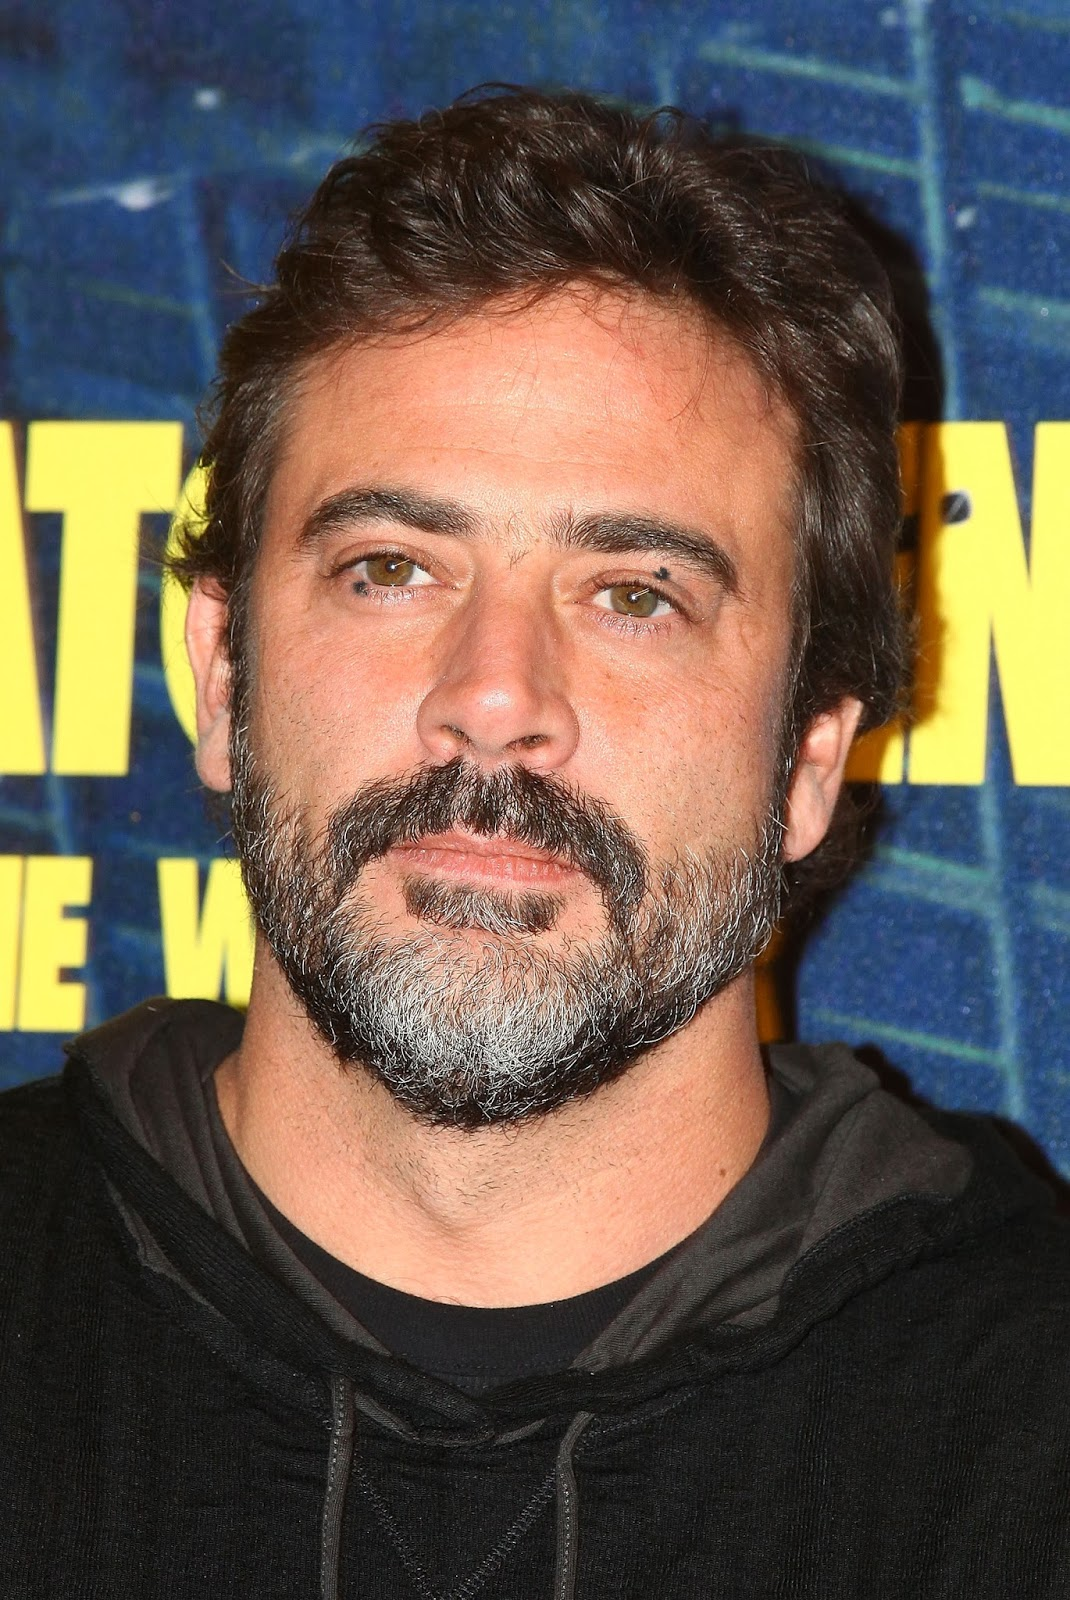 Hot Rod T Shirts >> Collection of beard styles: Jeffrey Dean Morgan Beard Styles